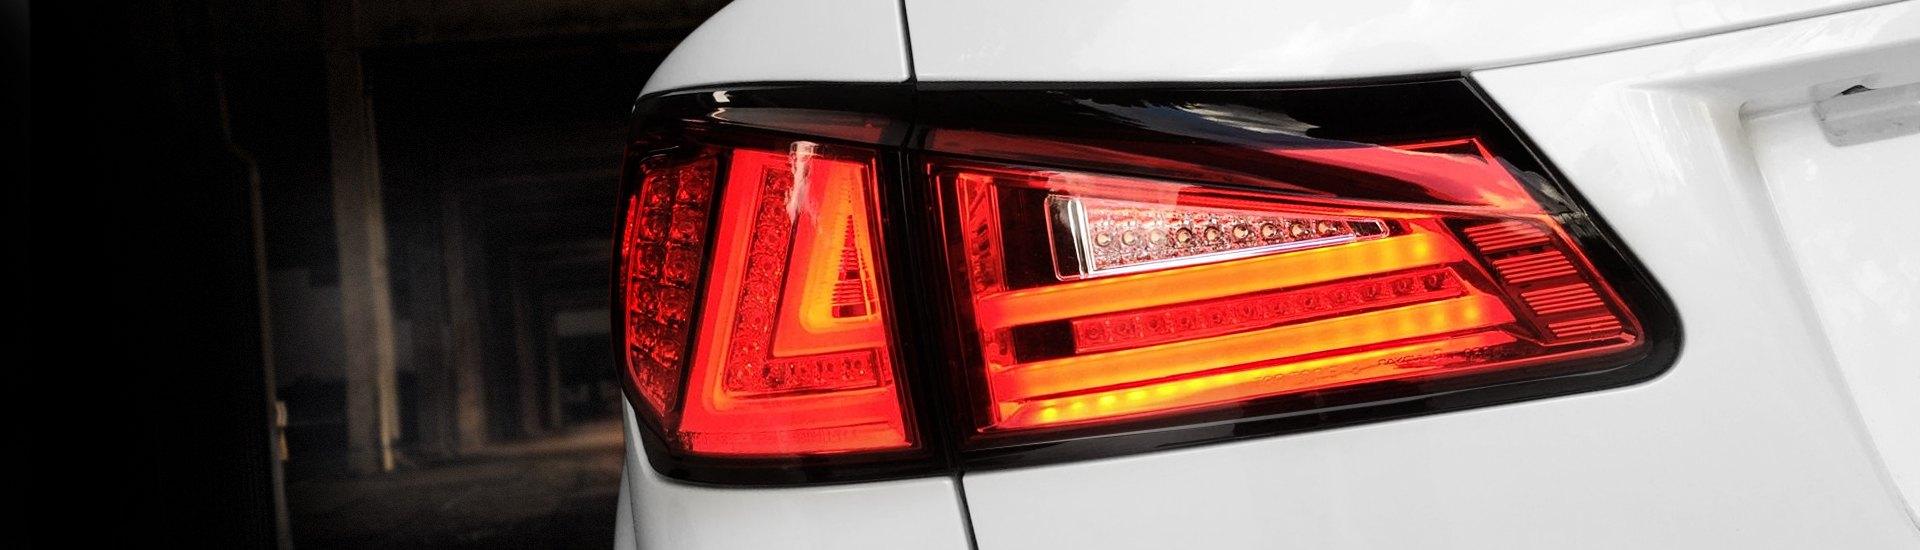 hight resolution of custom factory tail lights